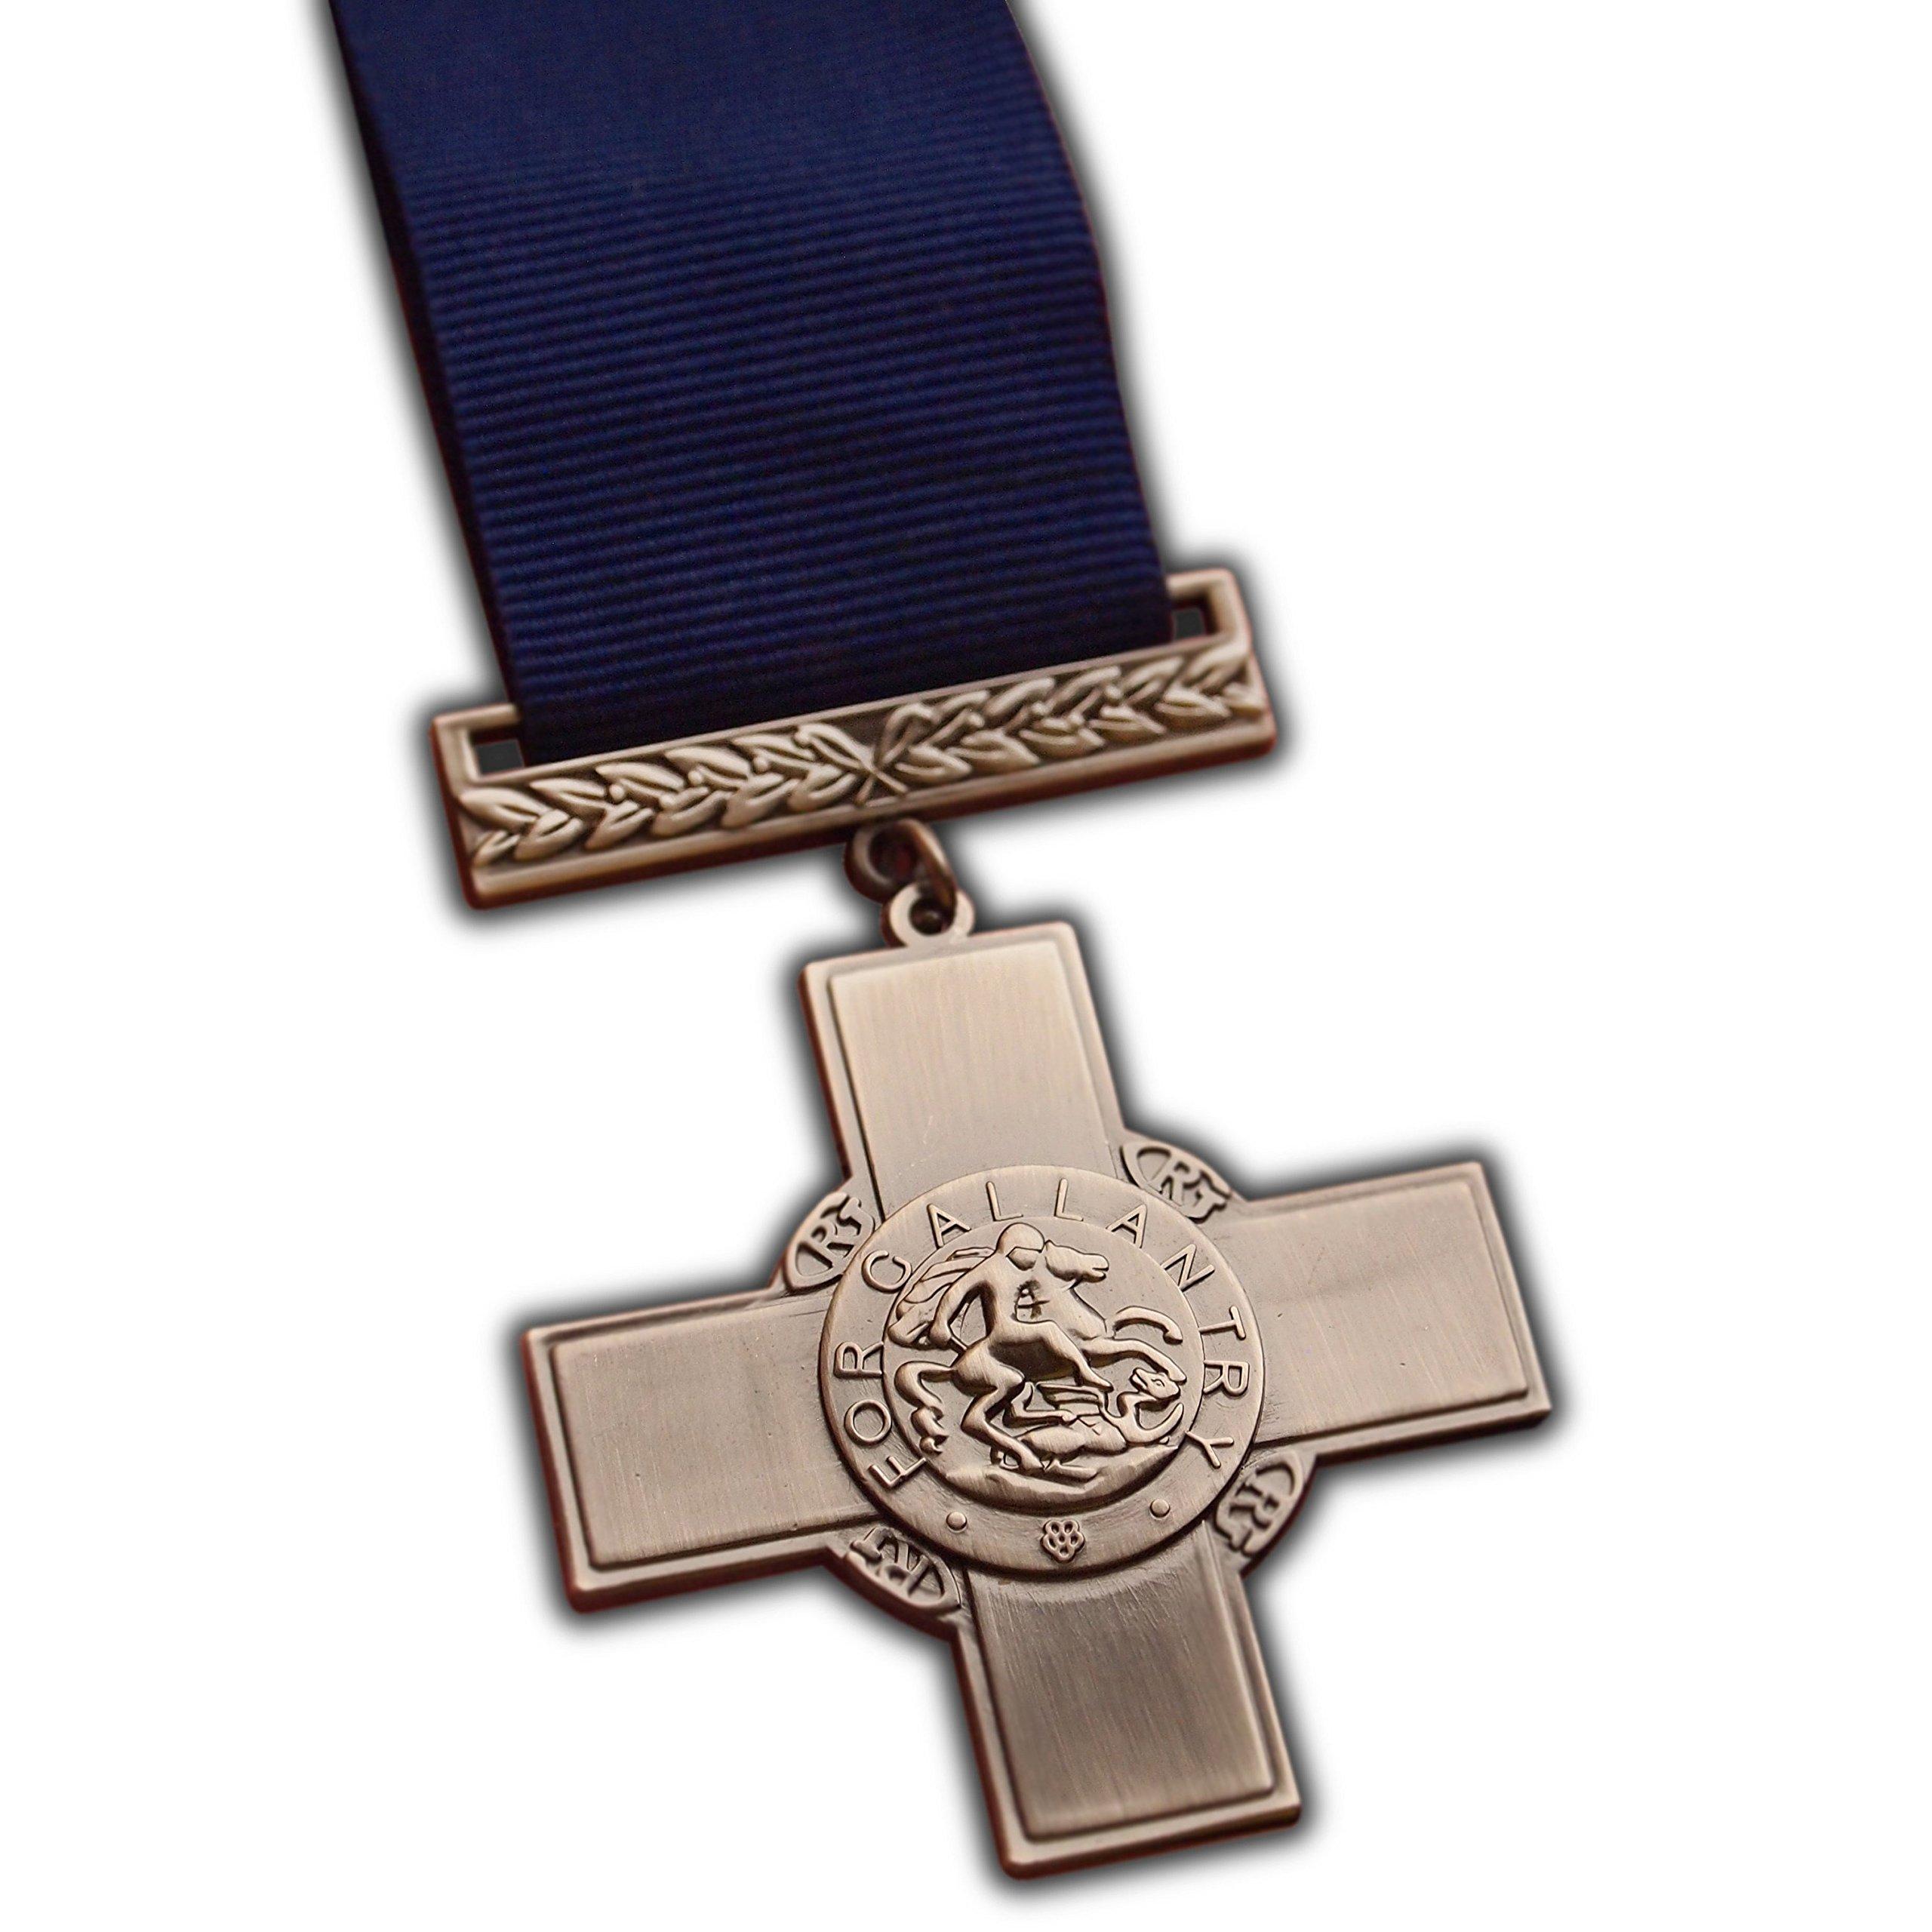 The George Cross Highest Gallantry Award for Civilians & Military WW2 | Army | Navy | RAF | Replica